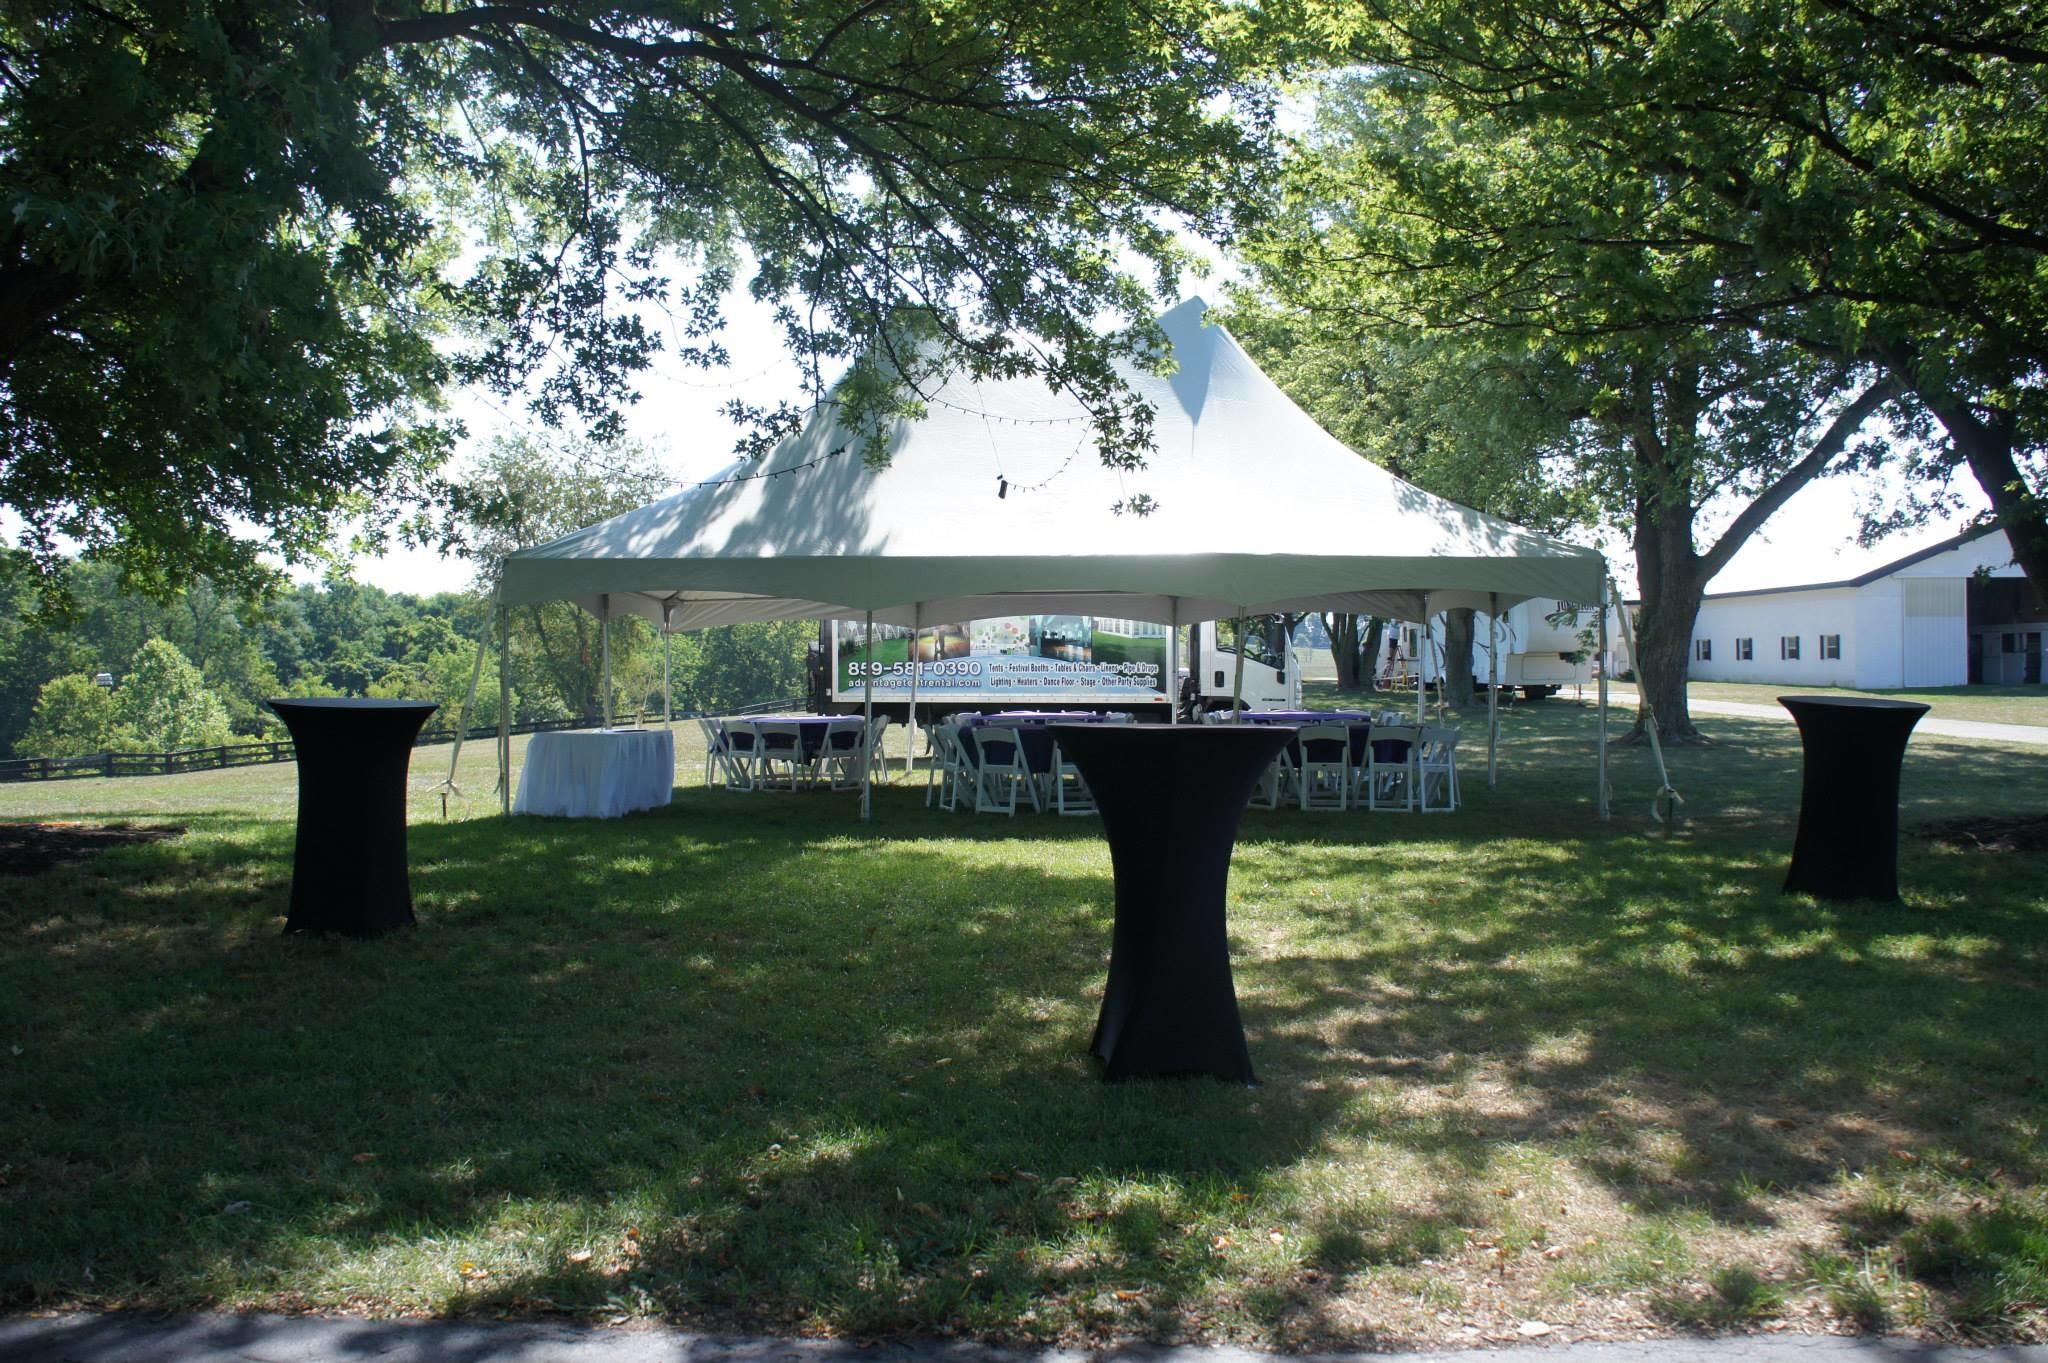 anna chair cover & wedding linens rental burnaby bc bar stool ikea graduation tent northern kentucky